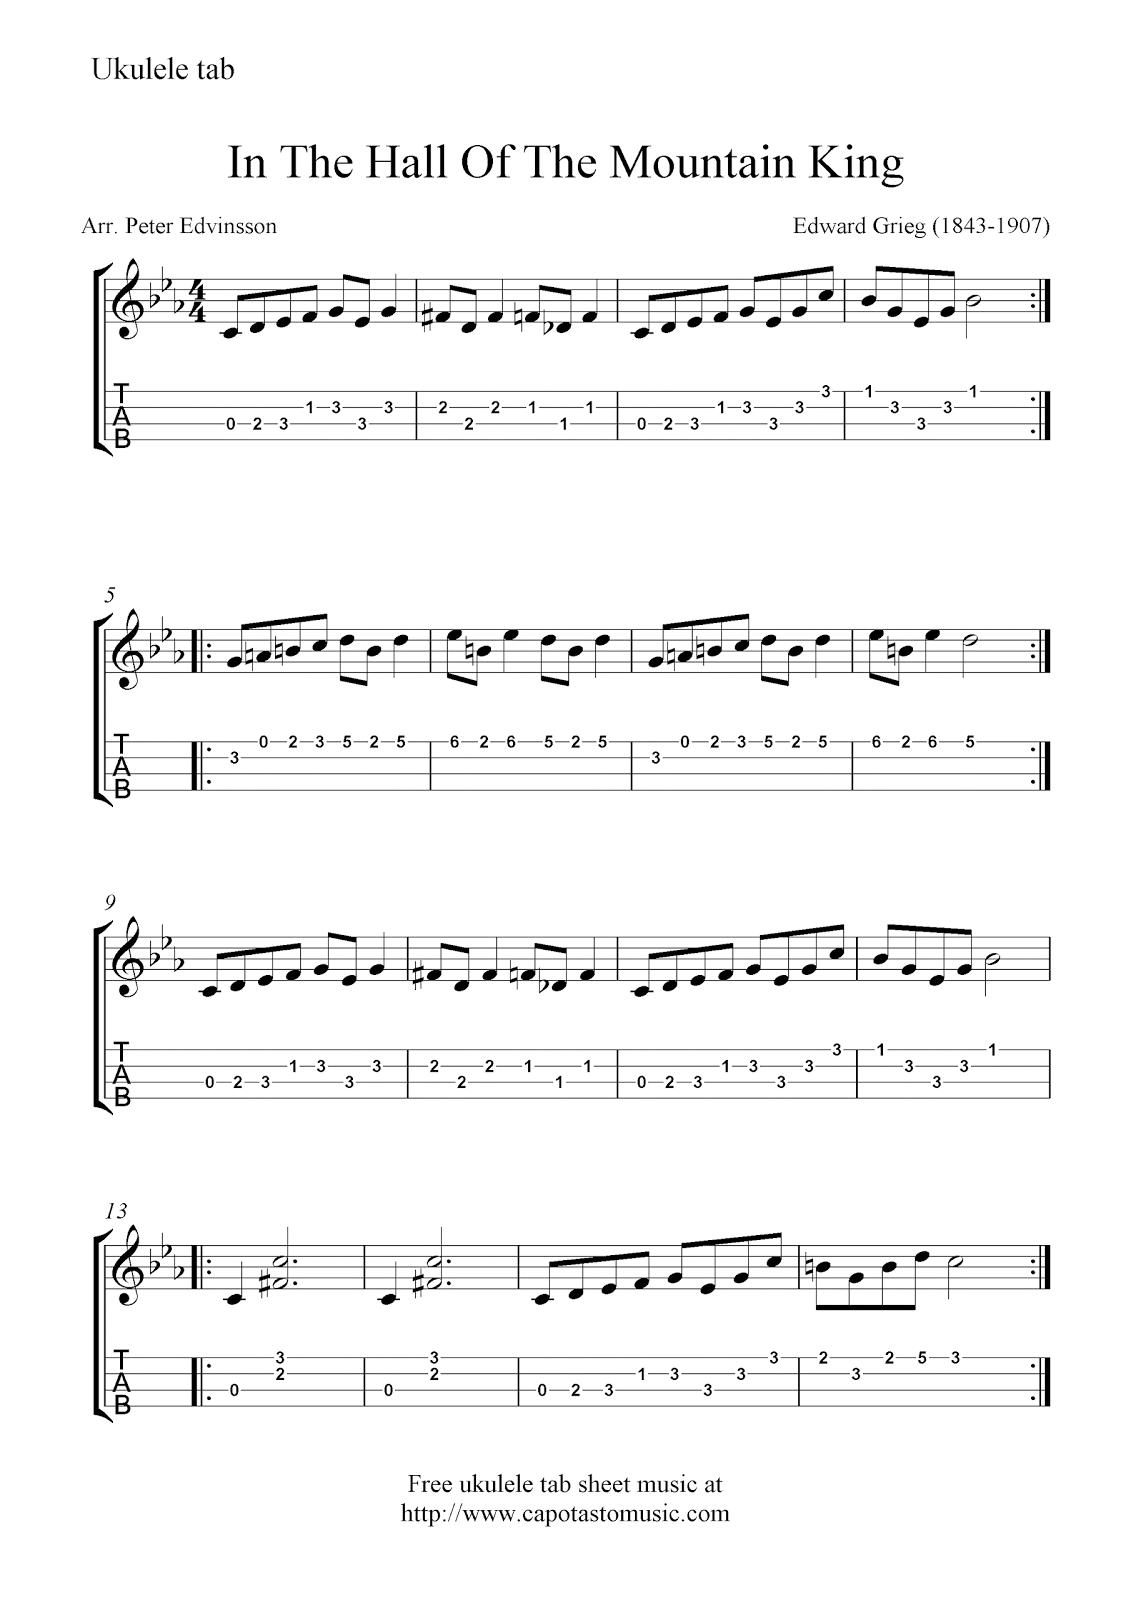 Free Sheet Music Scores Free Ukulele Tab Sheet Music In The Hall